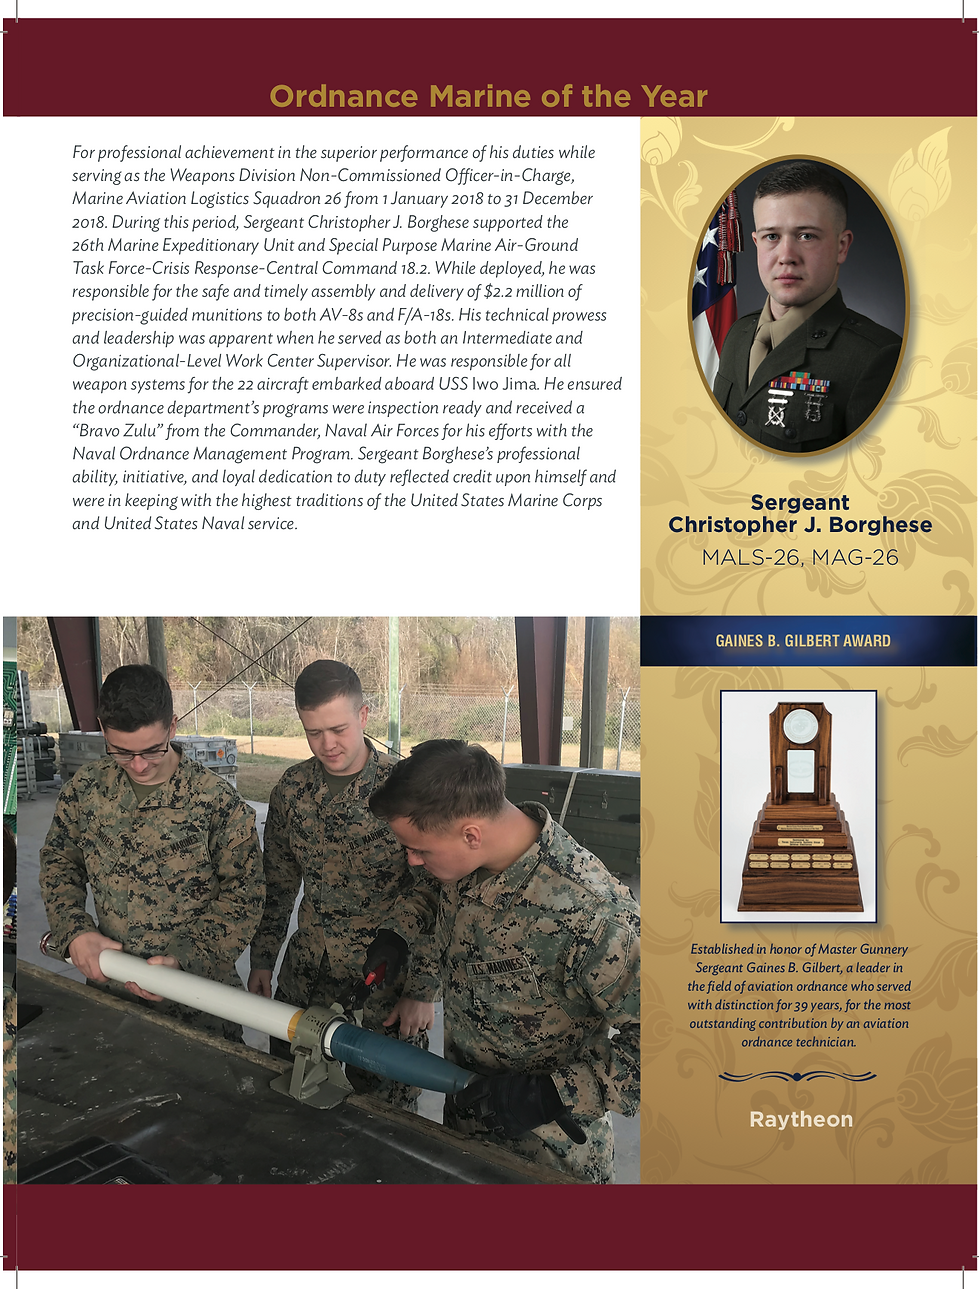 2019 Gaines B. Gilbert Award